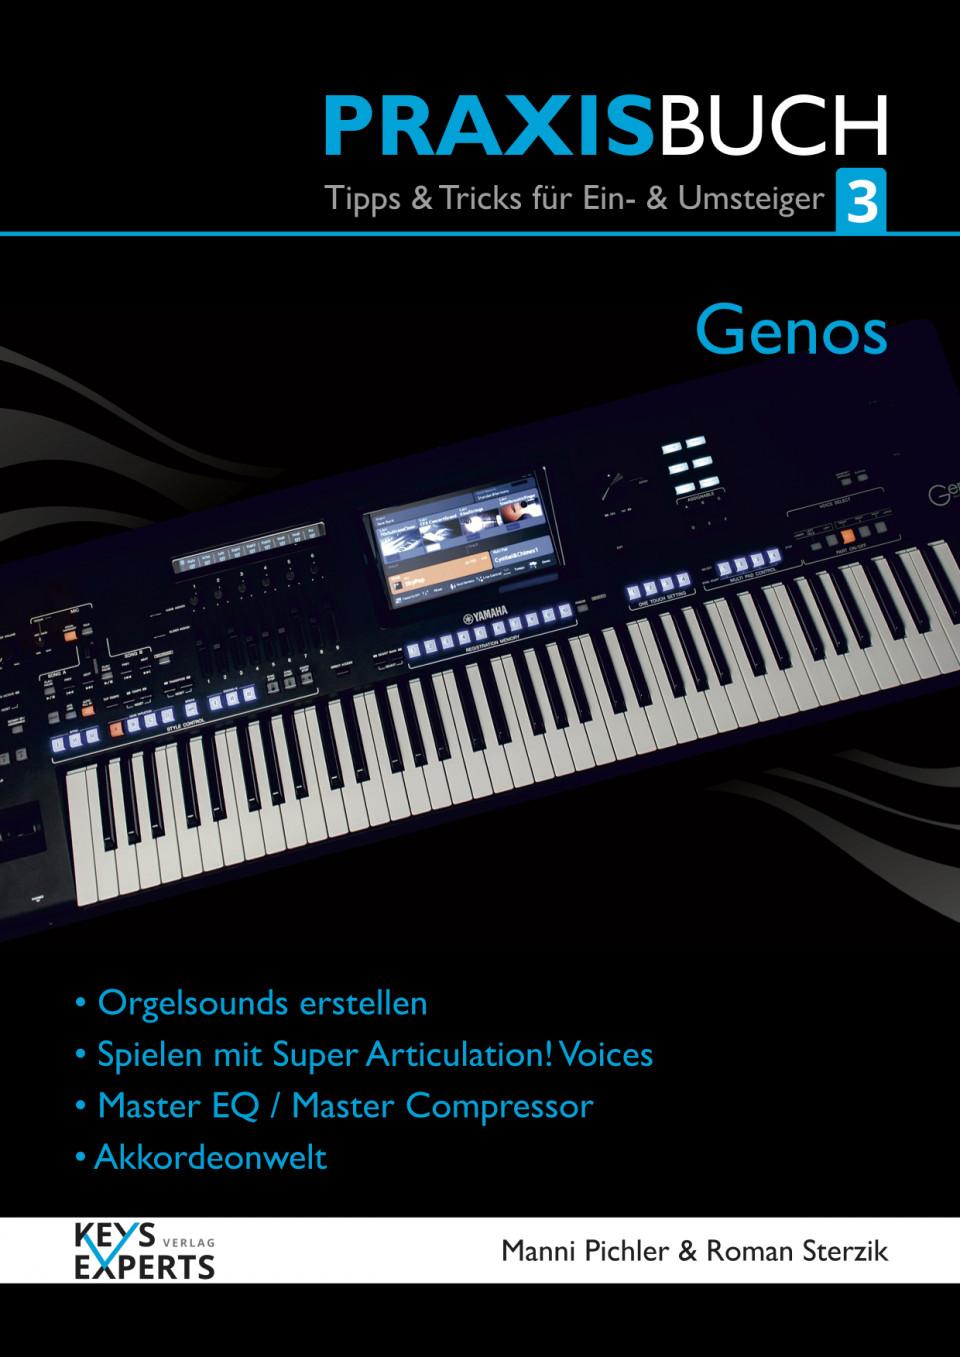 Keys Experts Praxisbuch 3 Genos